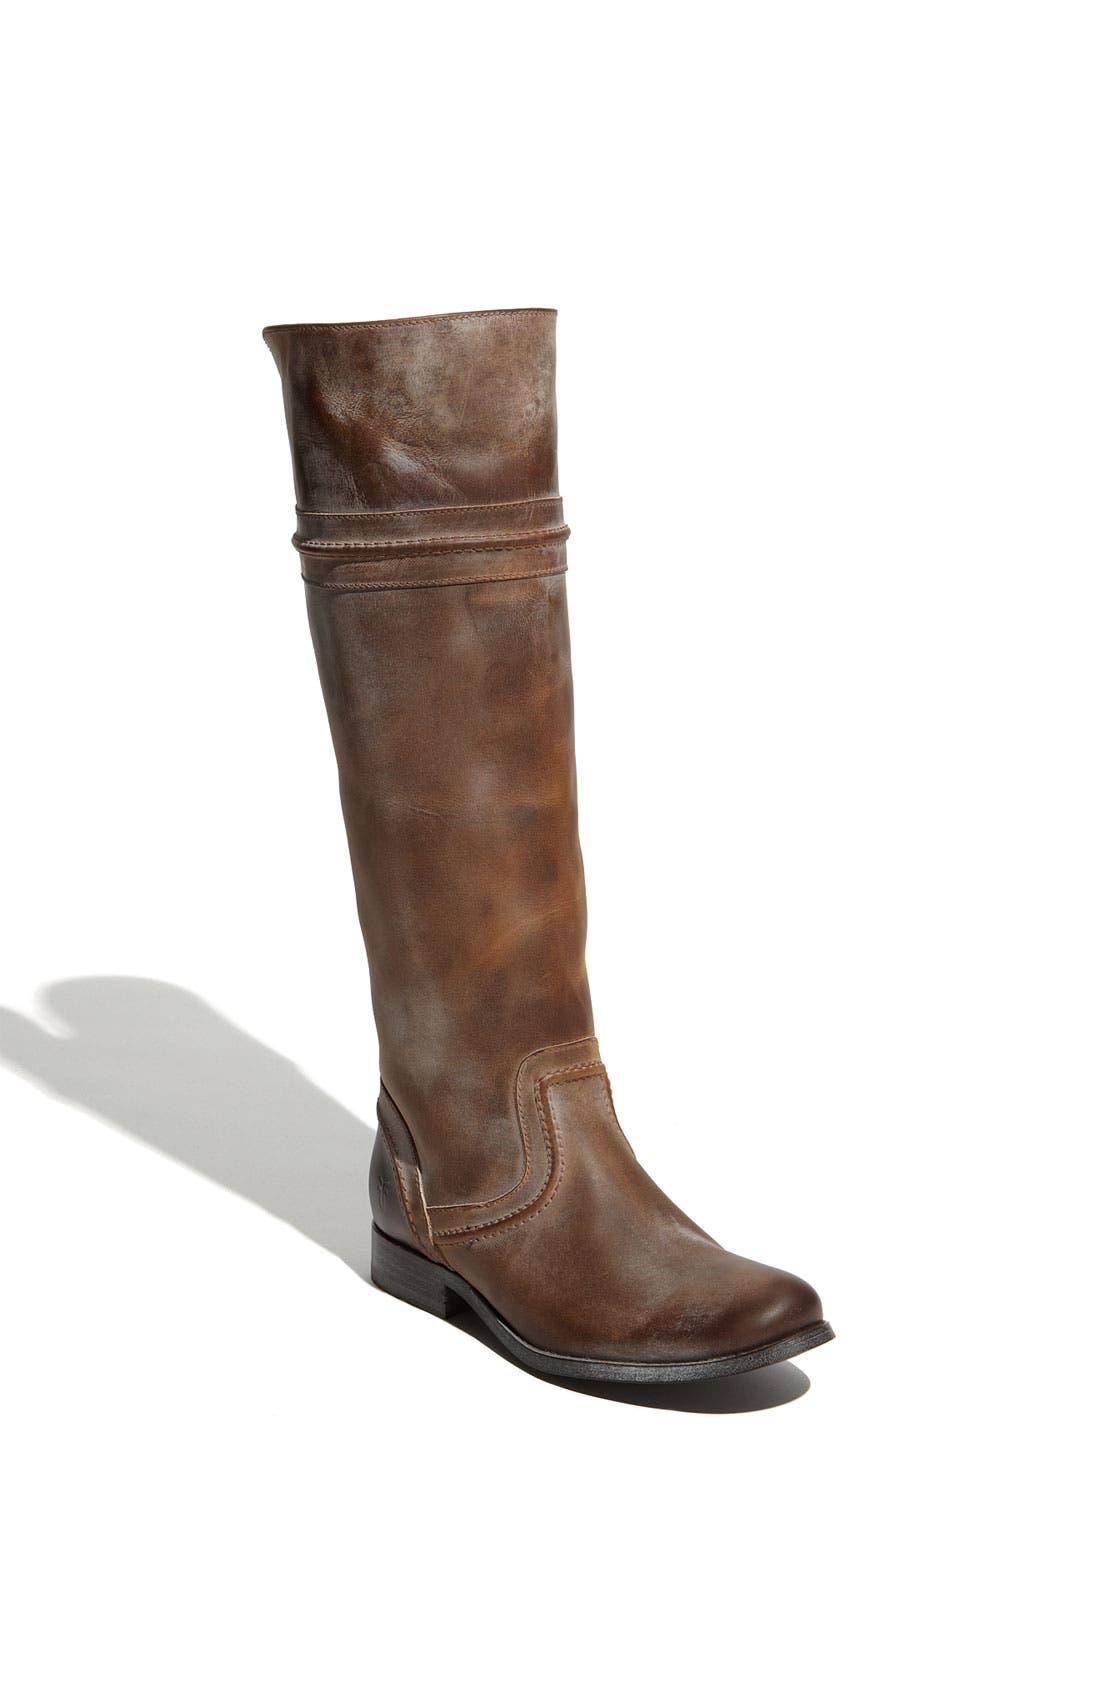 Alternate Image 1 Selected - Frye 'Melissa Trapunto' Boot